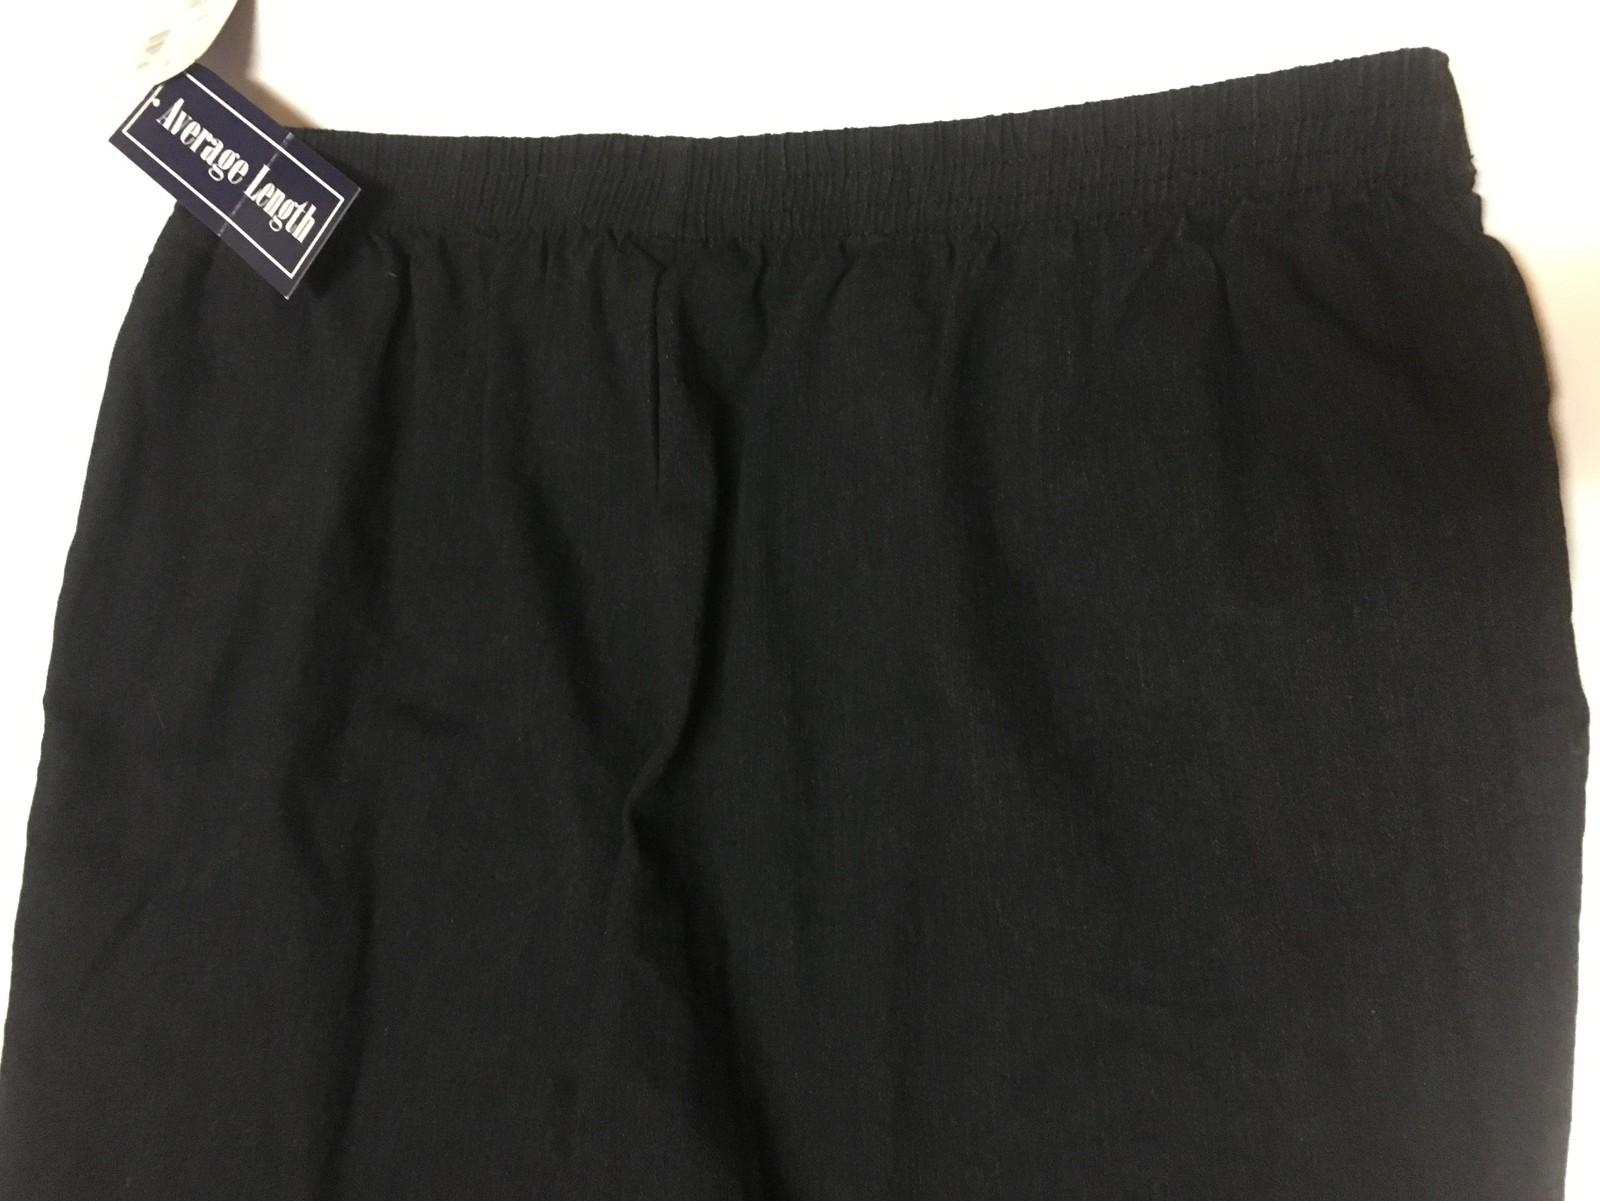 Laura Scott Black Denim Stretch Pants Sz 24W NWT (40 x 28)